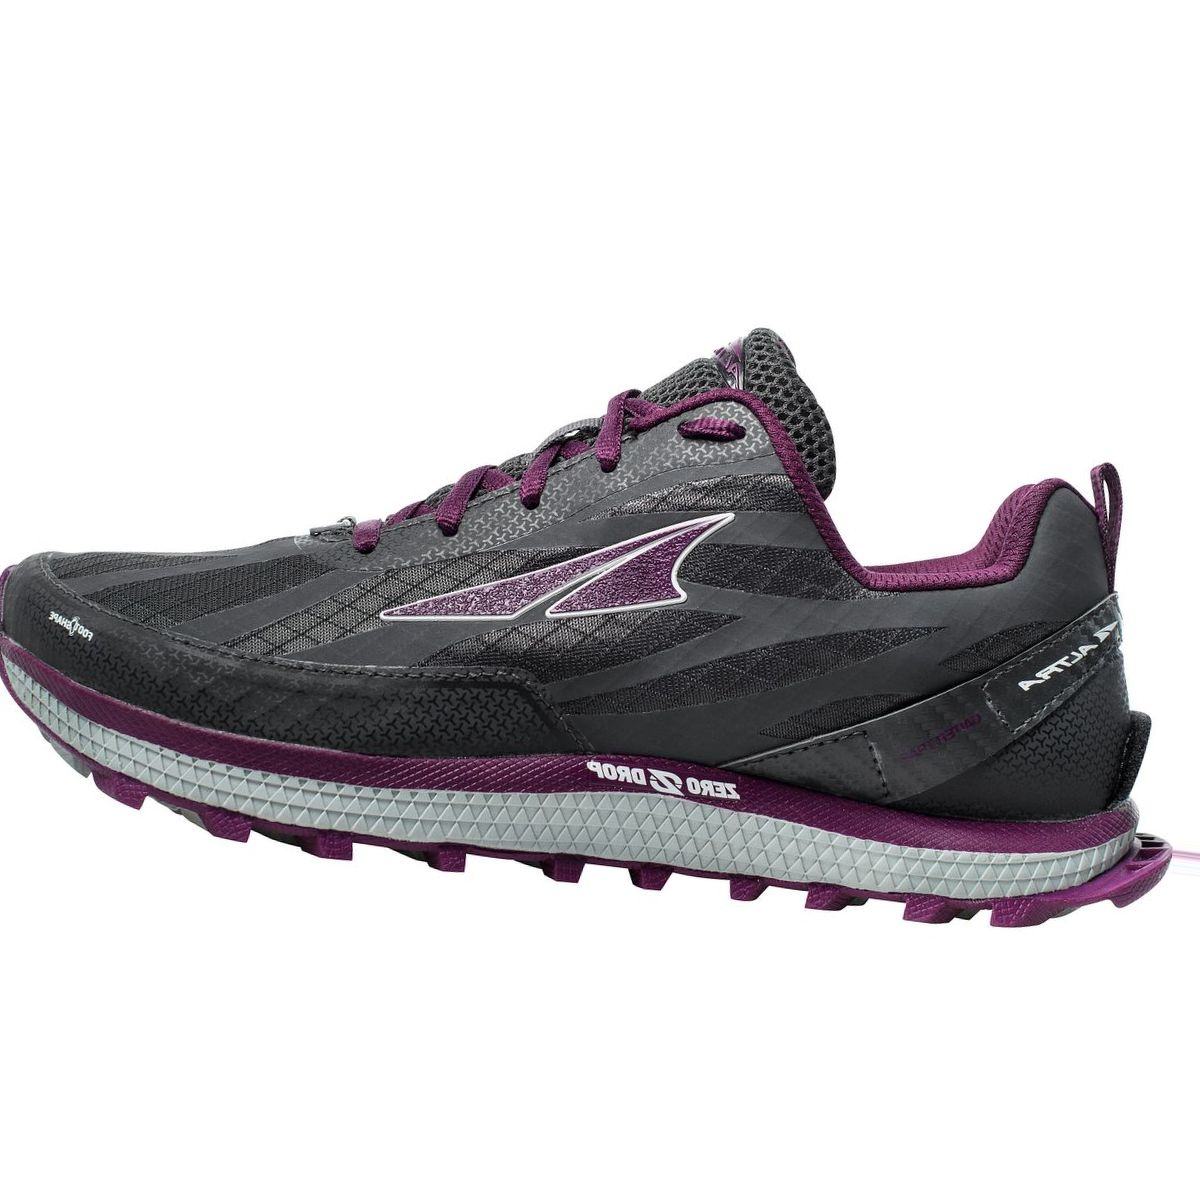 Altra Superior 3.5 Trail Running Shoe - Women's